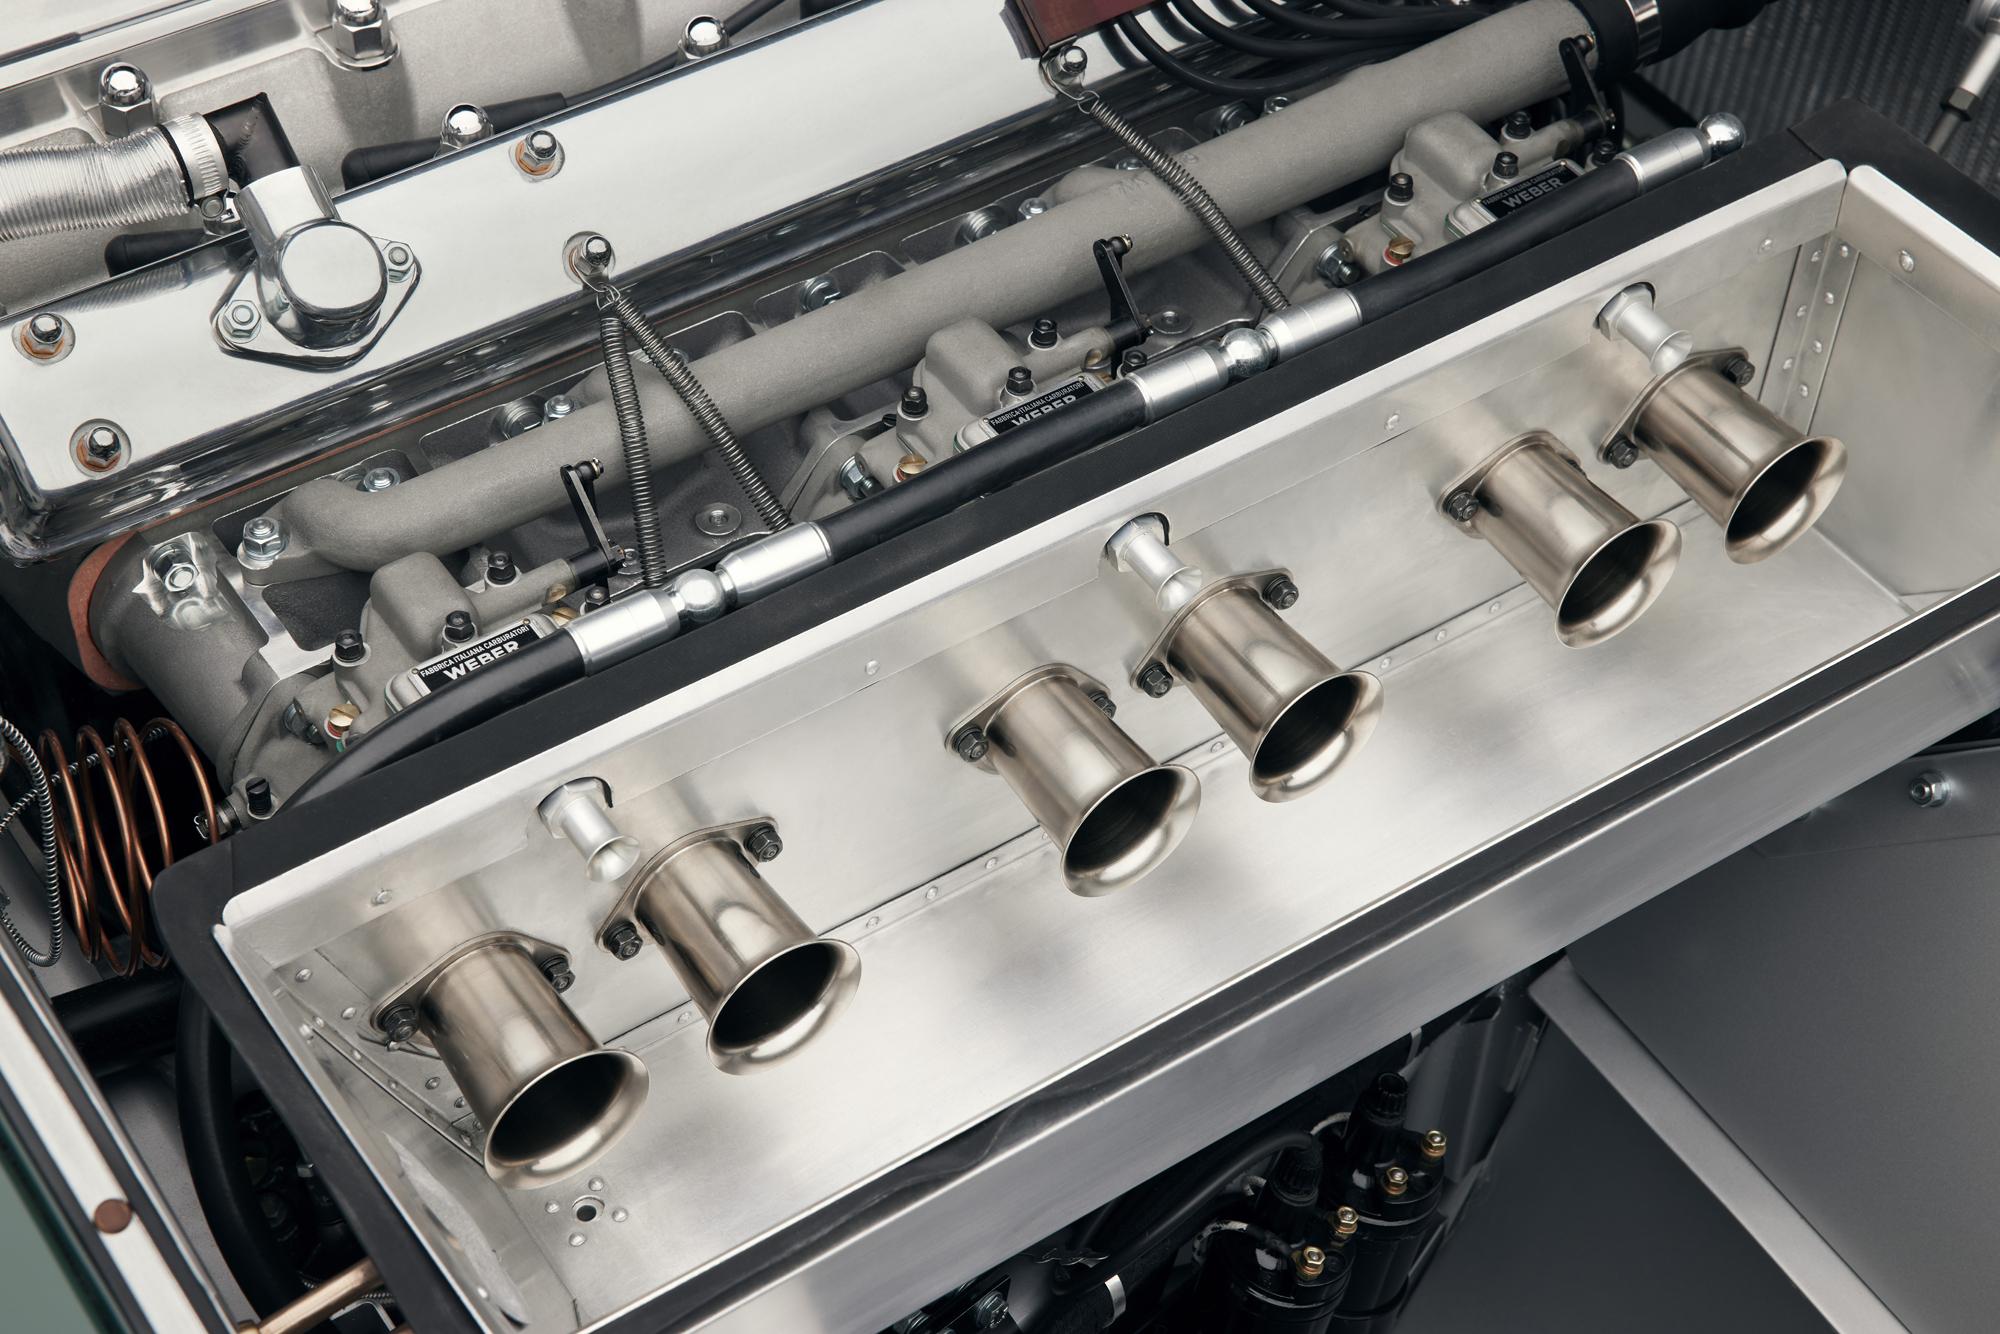 Jaguar C-type continuation engine